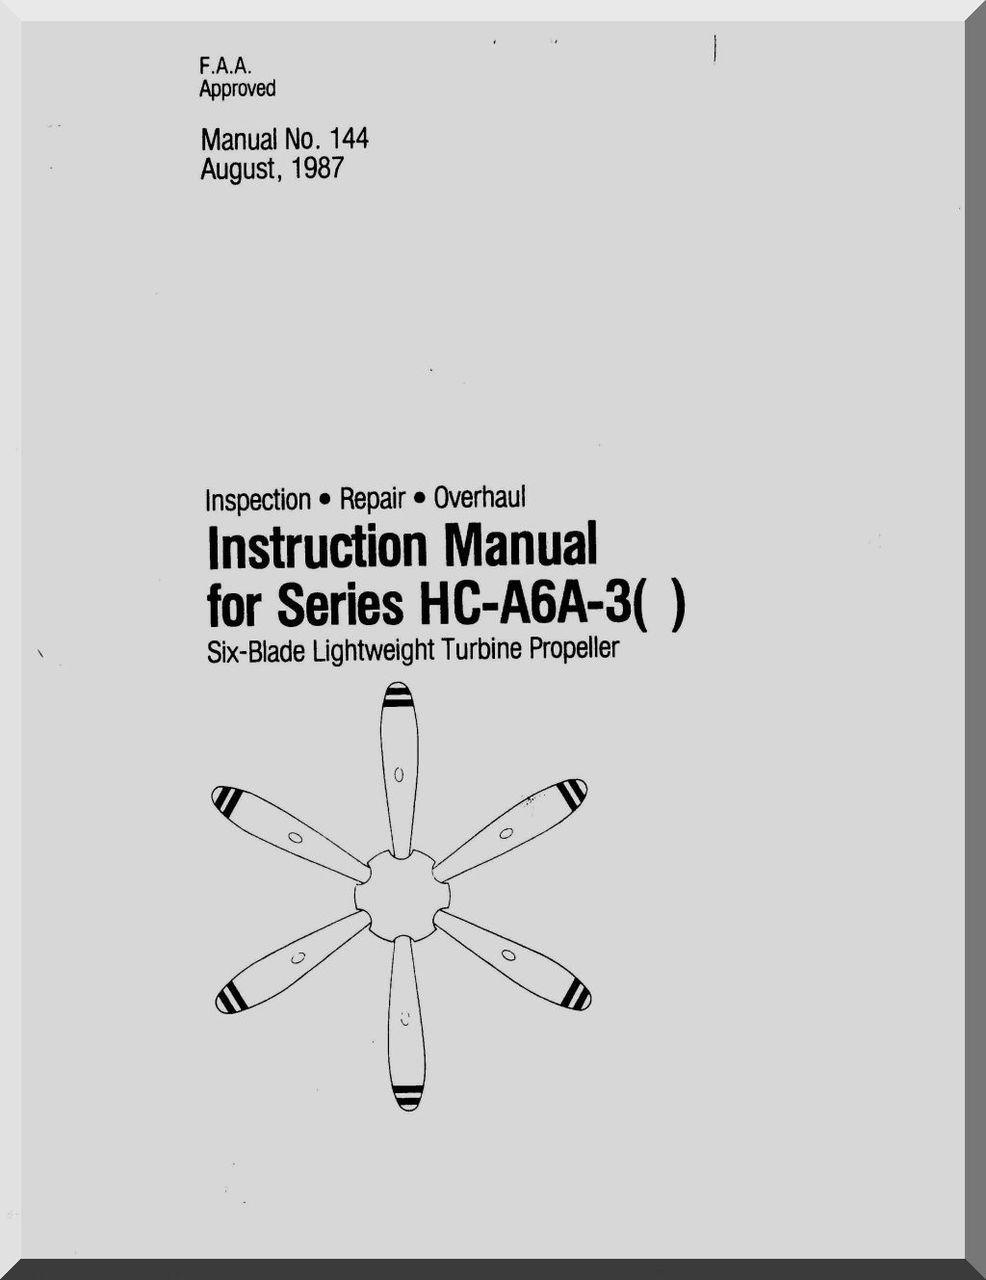 Hartzell Aircraft Propeller Instruction Manual for HC-A6A-3() -144 -  Aircraft Reports - Manuals Aircraft Helicopter Engines Propellers  Blueprints ...